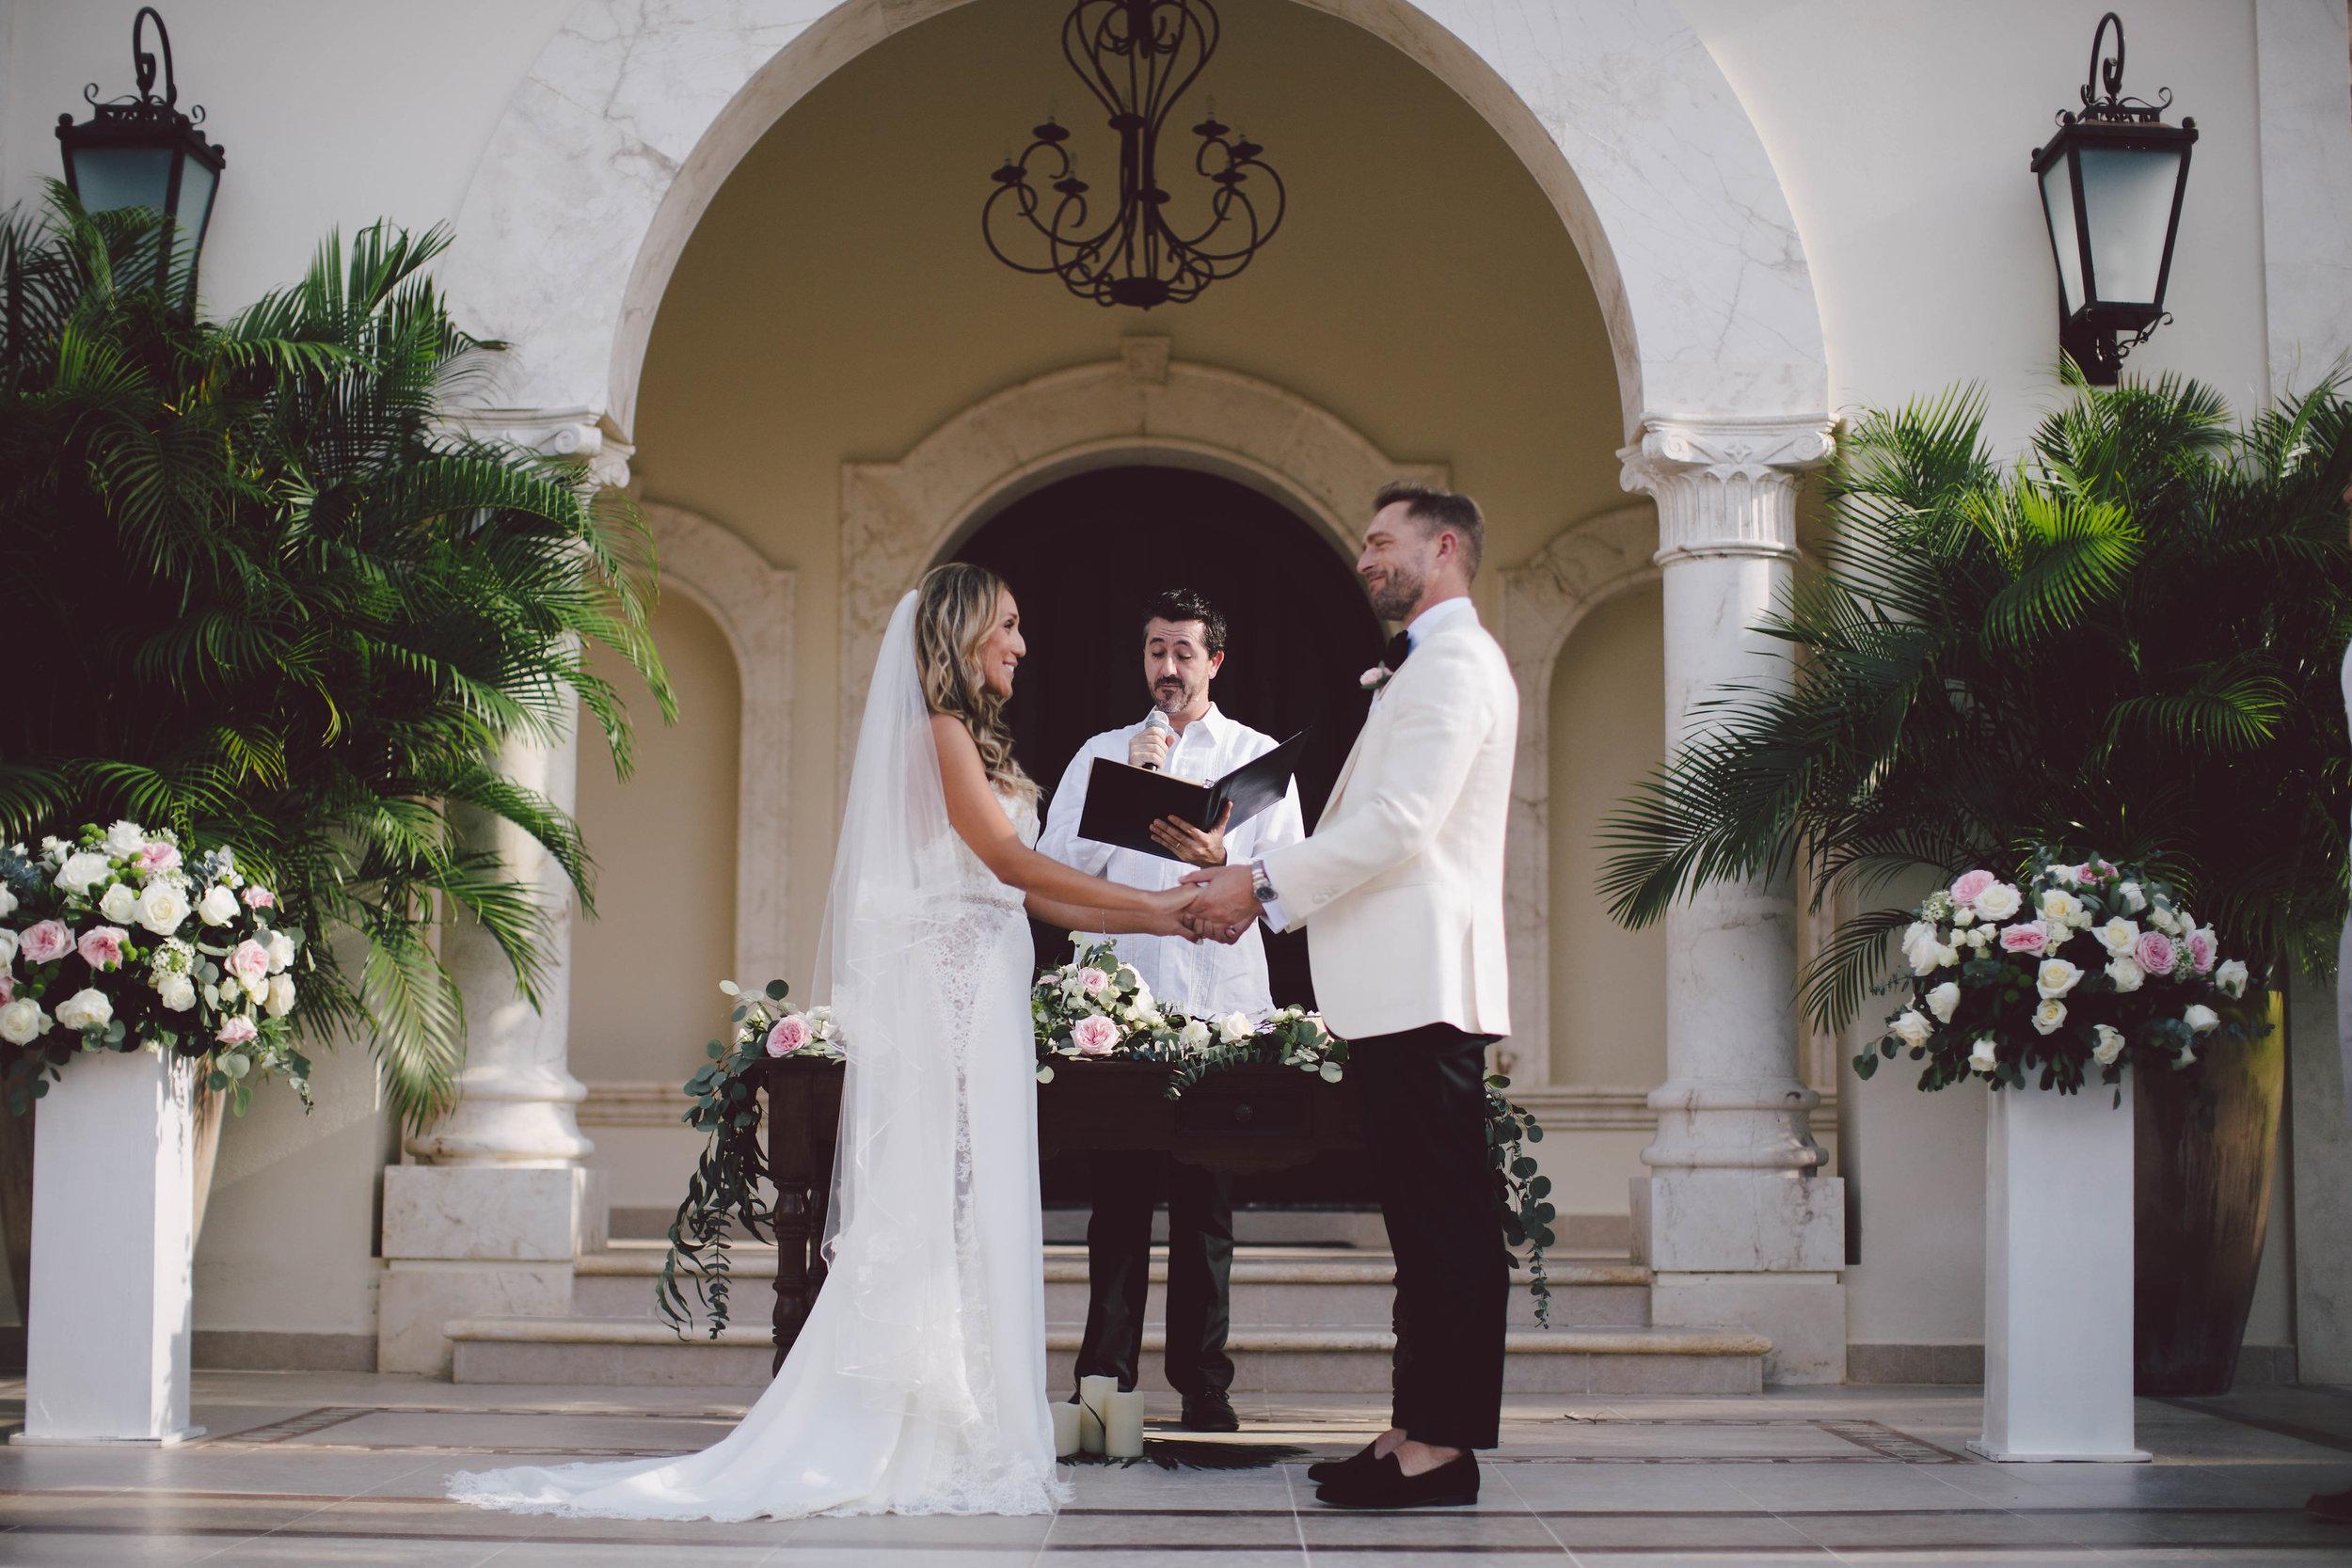 mexico_wedding_cancun_villa_la_joya_evangeline_lane_055.jpg